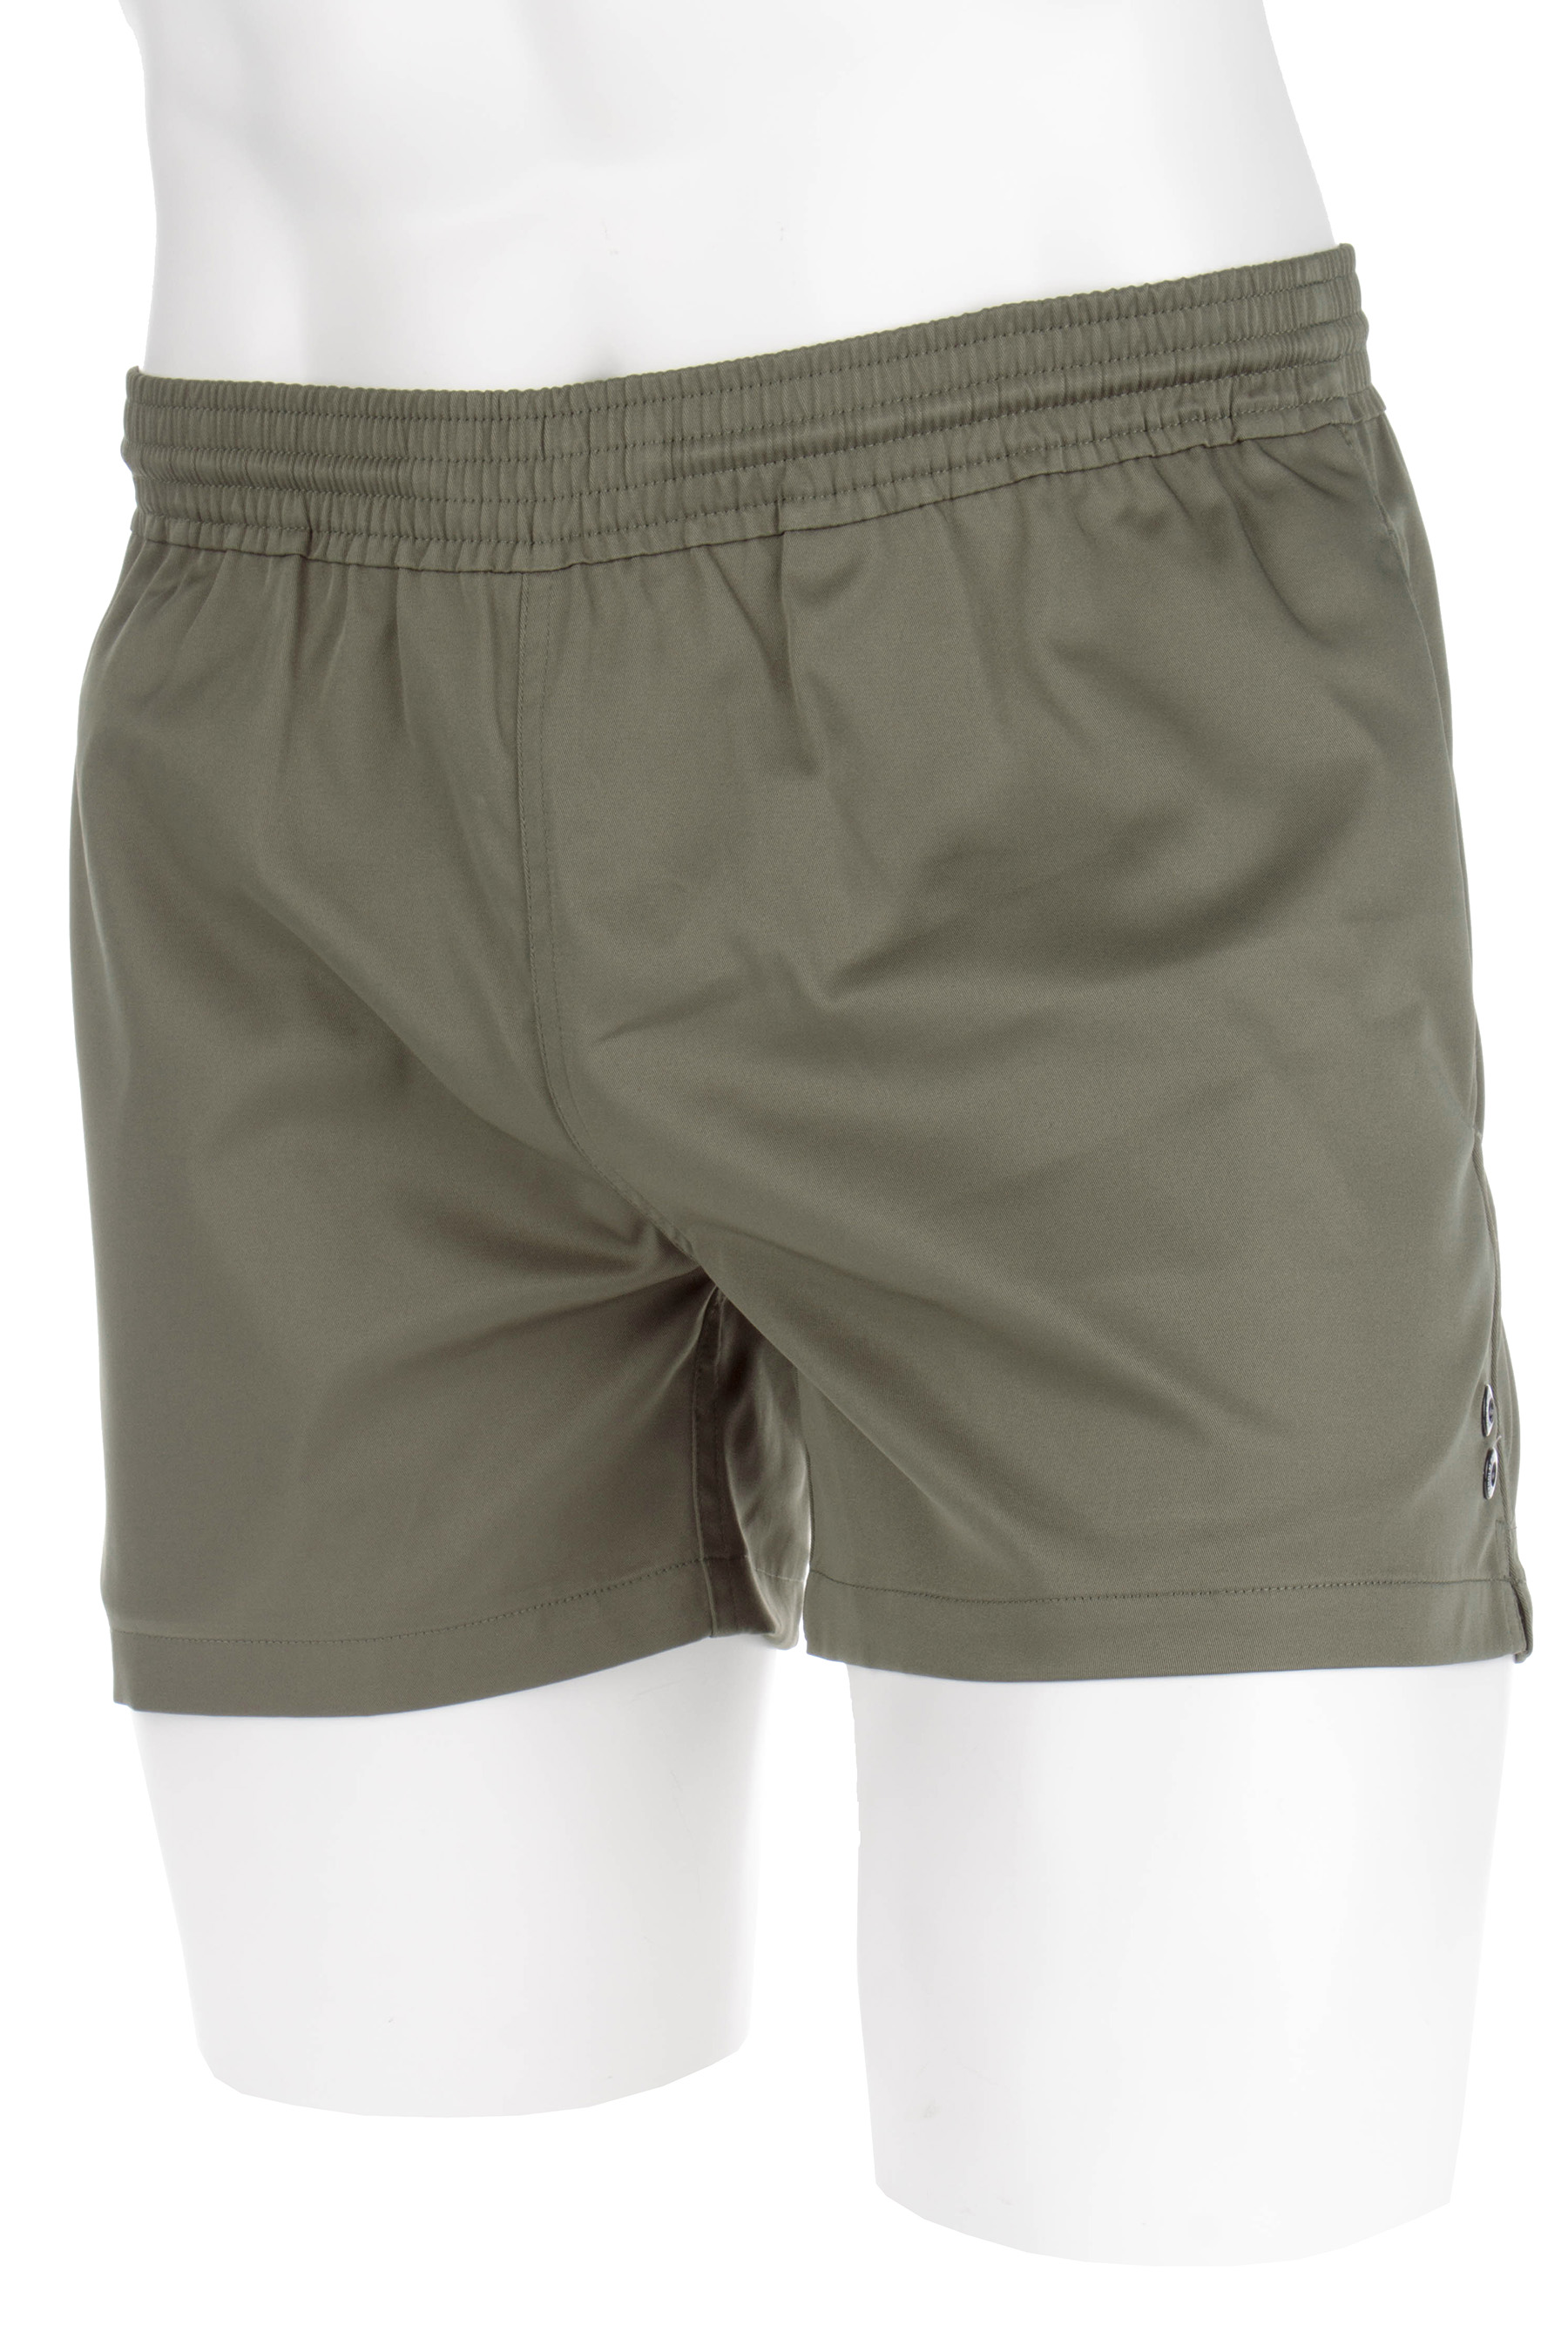 a1d7bb2f0f RON DORFF Swim Shorts | Swimwear | Clothing | Men | mientus Online Store